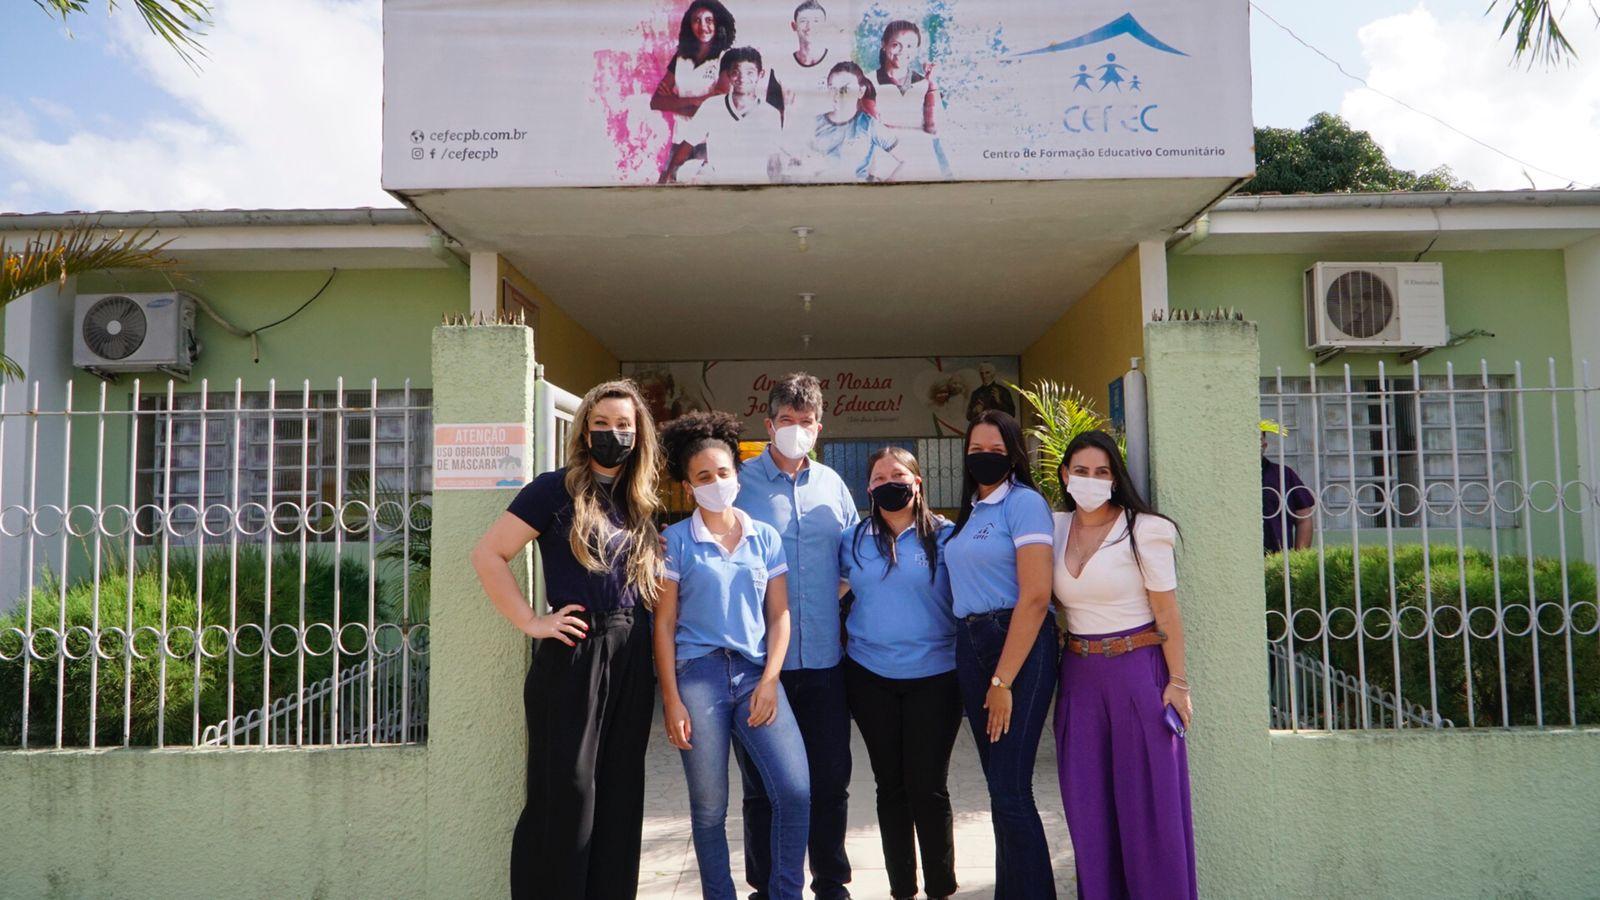 Ruy garante apoio a entidade social que beneficia mais de 250 crianças e adolescentes no bairro de Marcos Moura, em Santa Rita